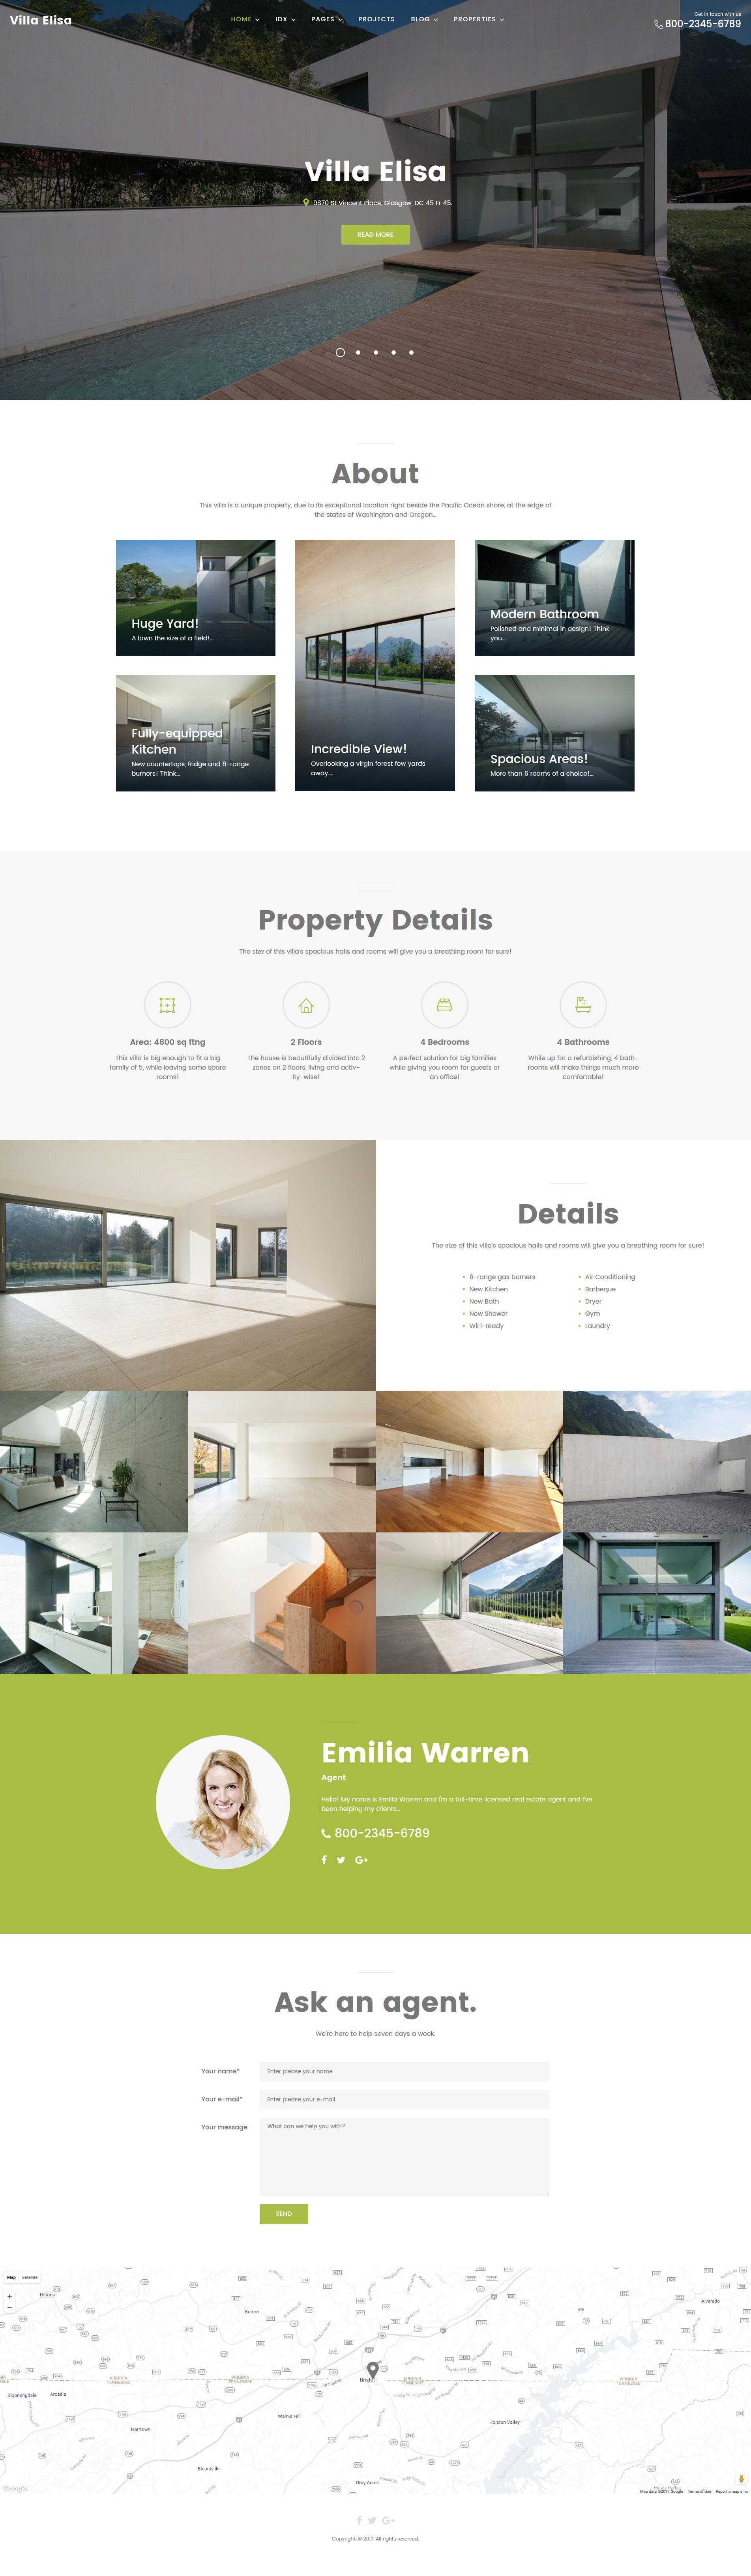 villa elisa real estate responsive wordpress theme. Black Bedroom Furniture Sets. Home Design Ideas